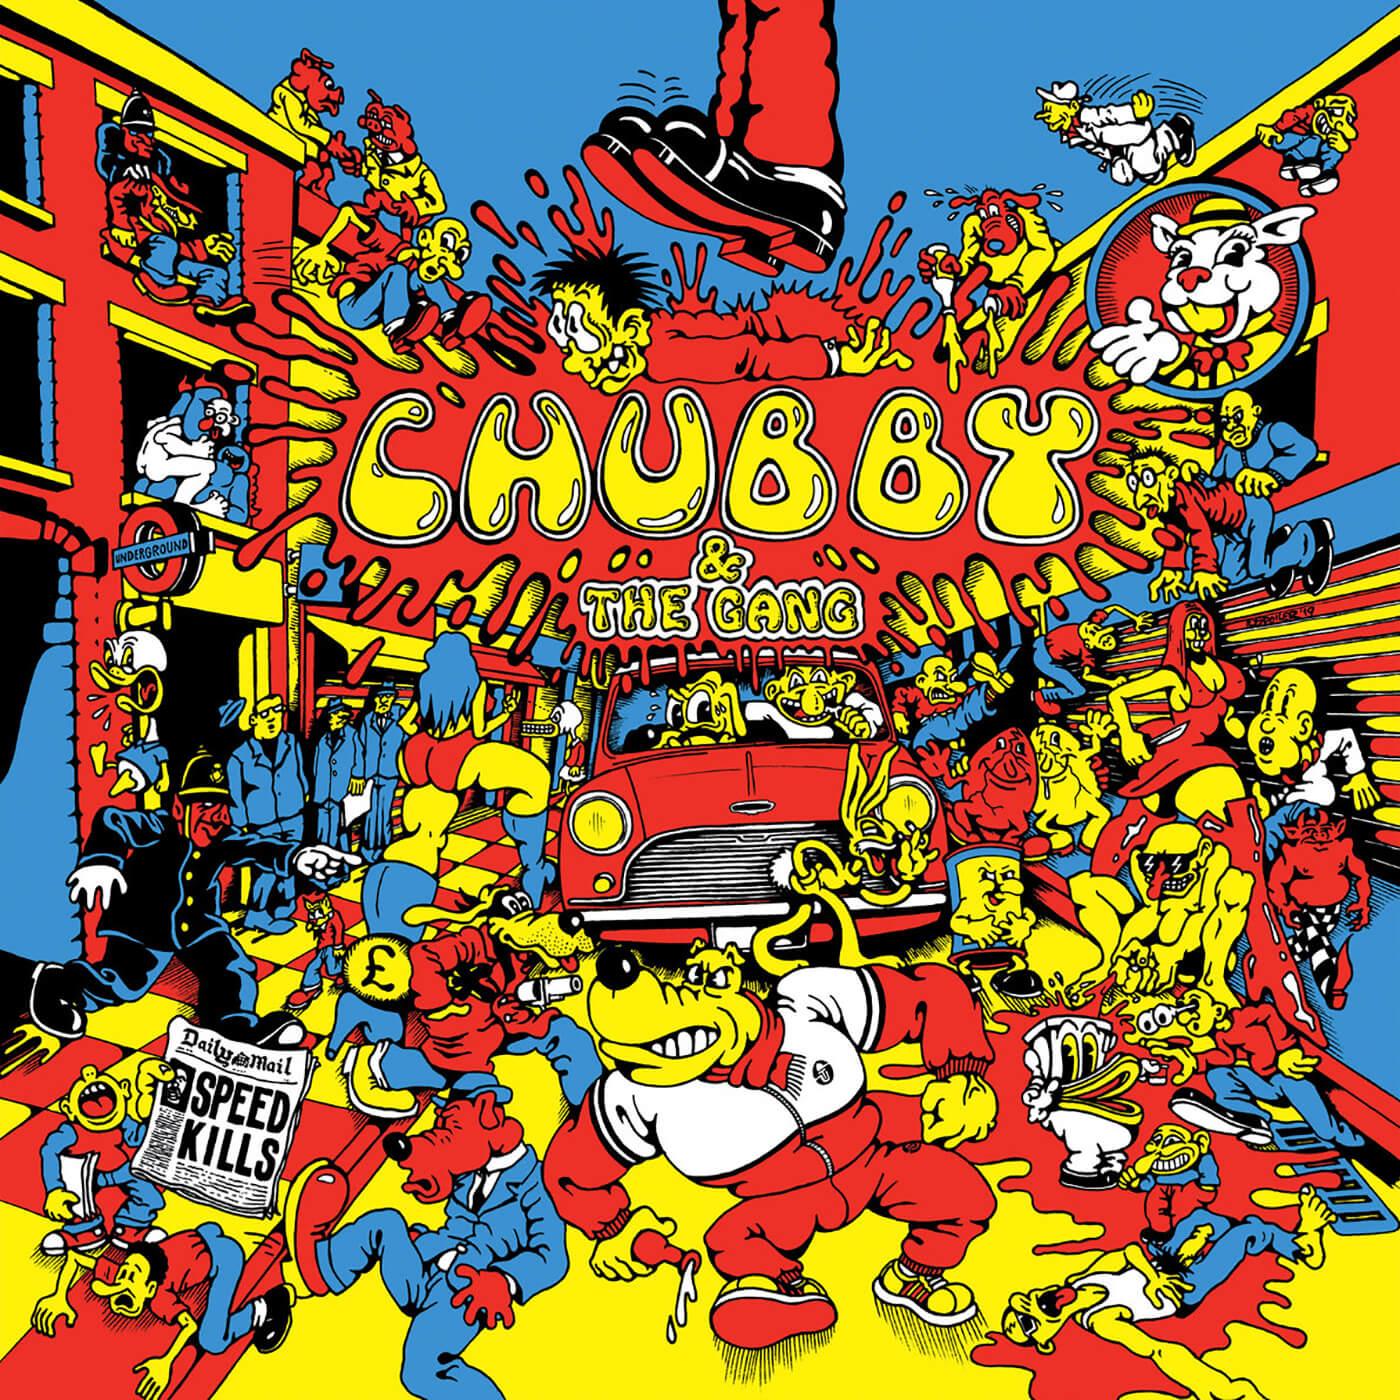 Chubby & The Gang - Speed Kills